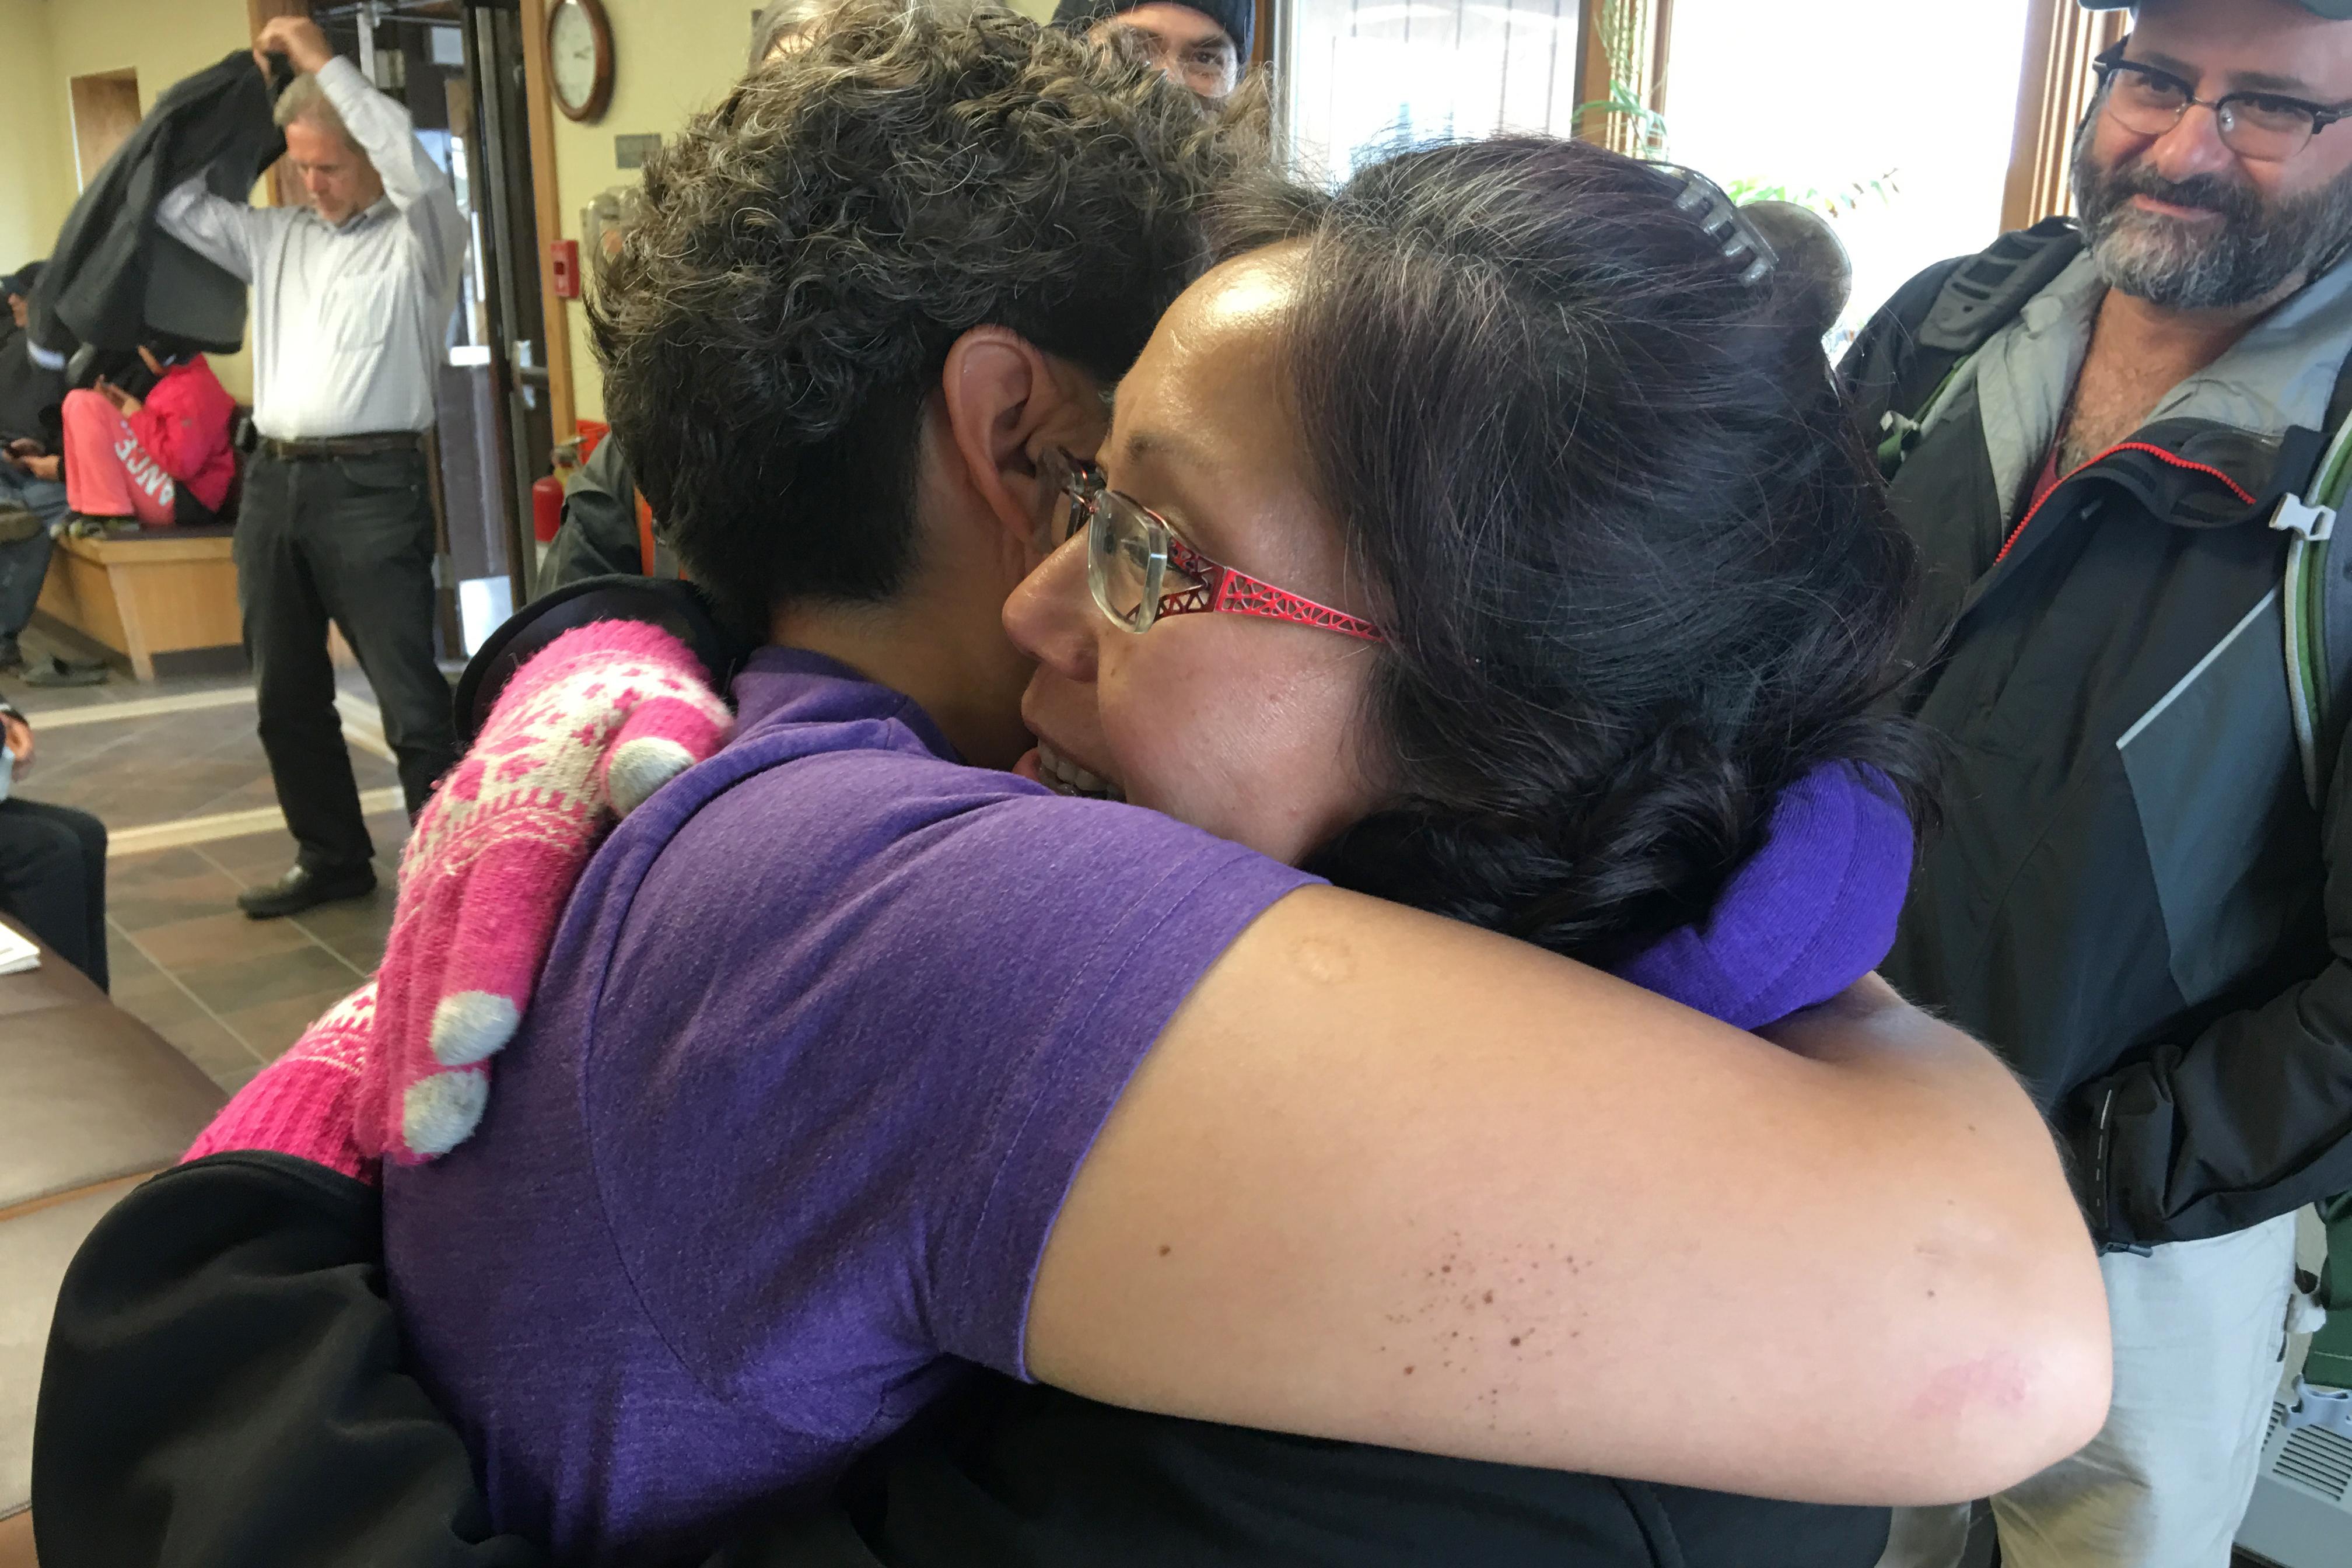 Etta Tall bids farewell to a friend in Nome before boarding a flight to Provideniya, Russia, June 2016. (Kirsten Swann / Alaska Dispatch News)